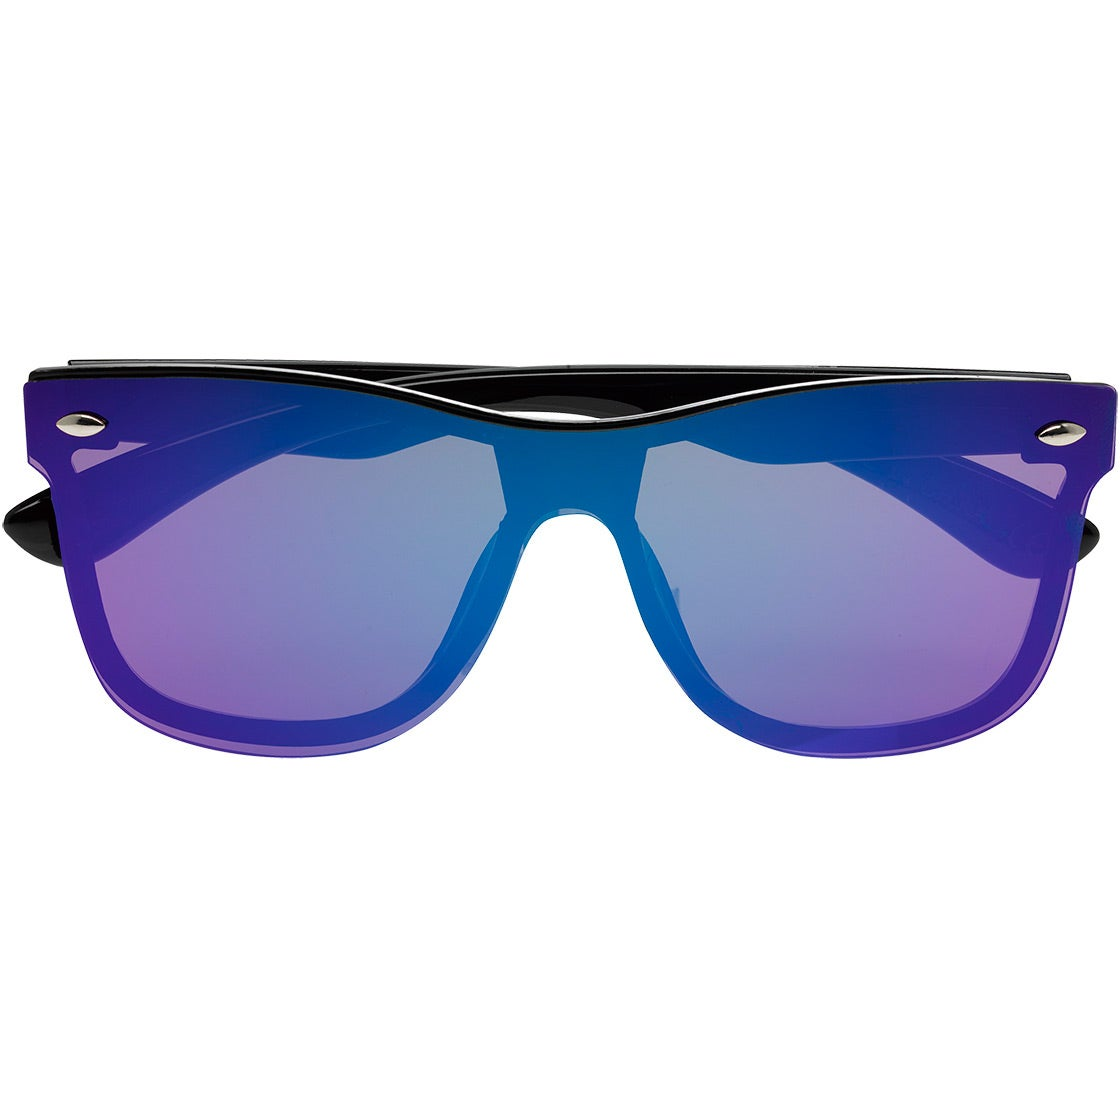 fa6a01de31b Outrider Malibu Sunglasses